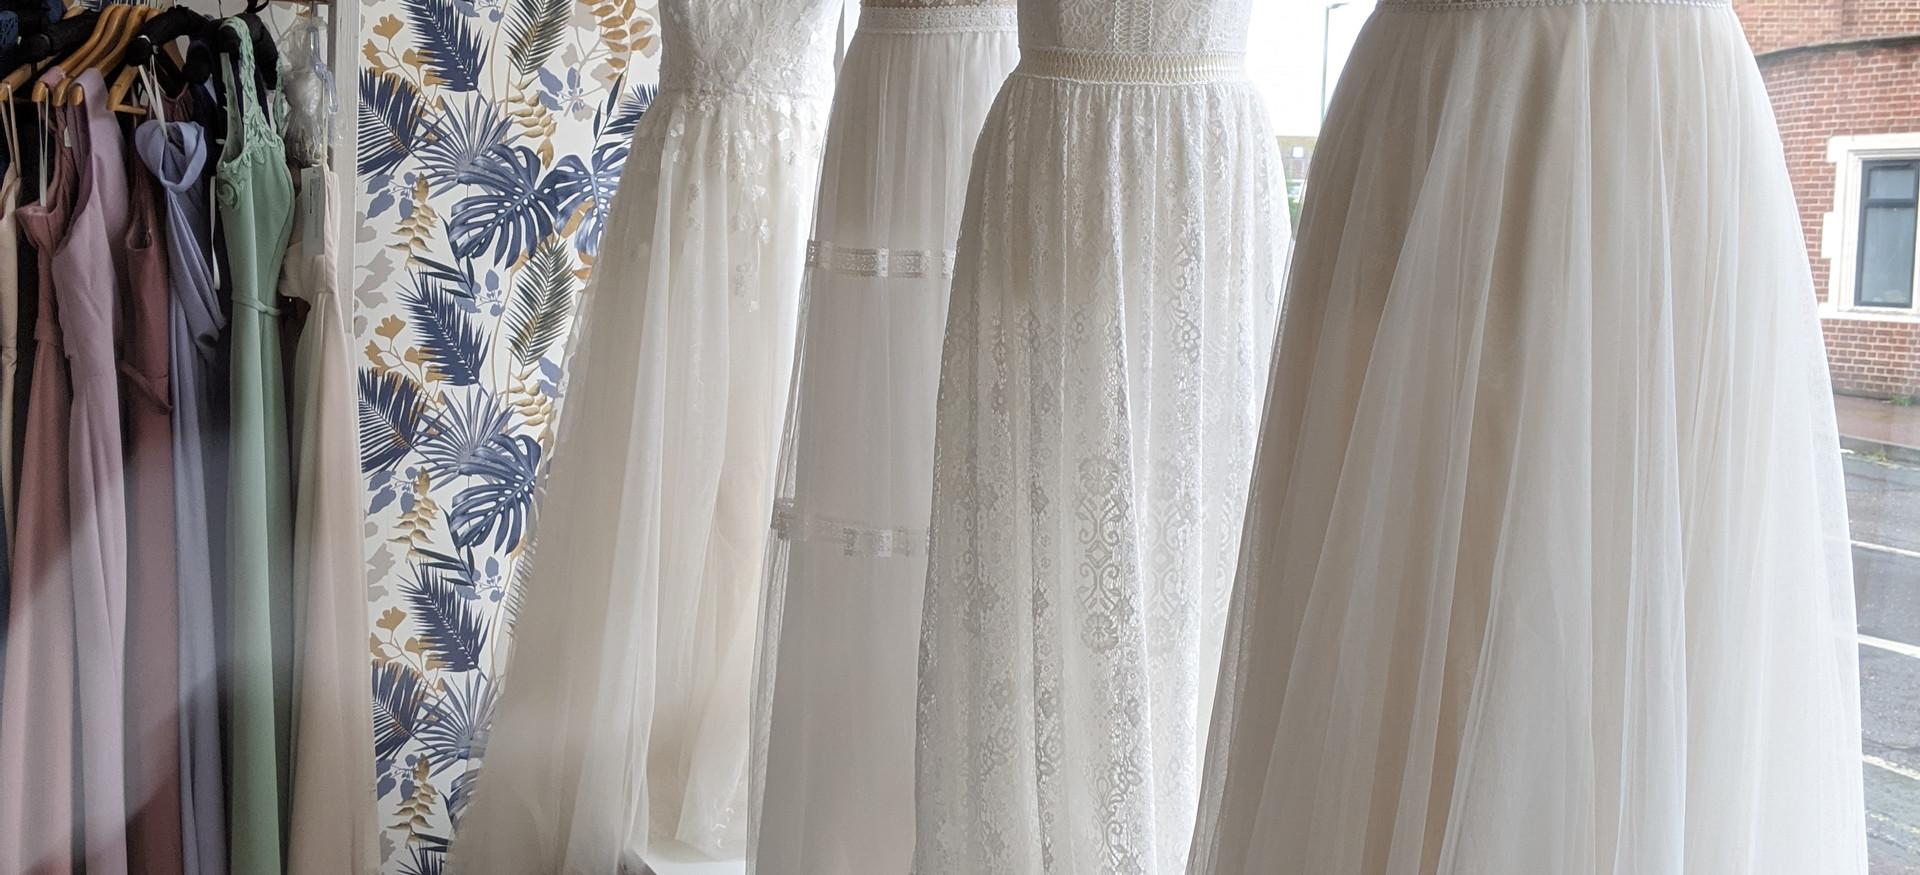 Pretty Smithy Bridal - Shop Front